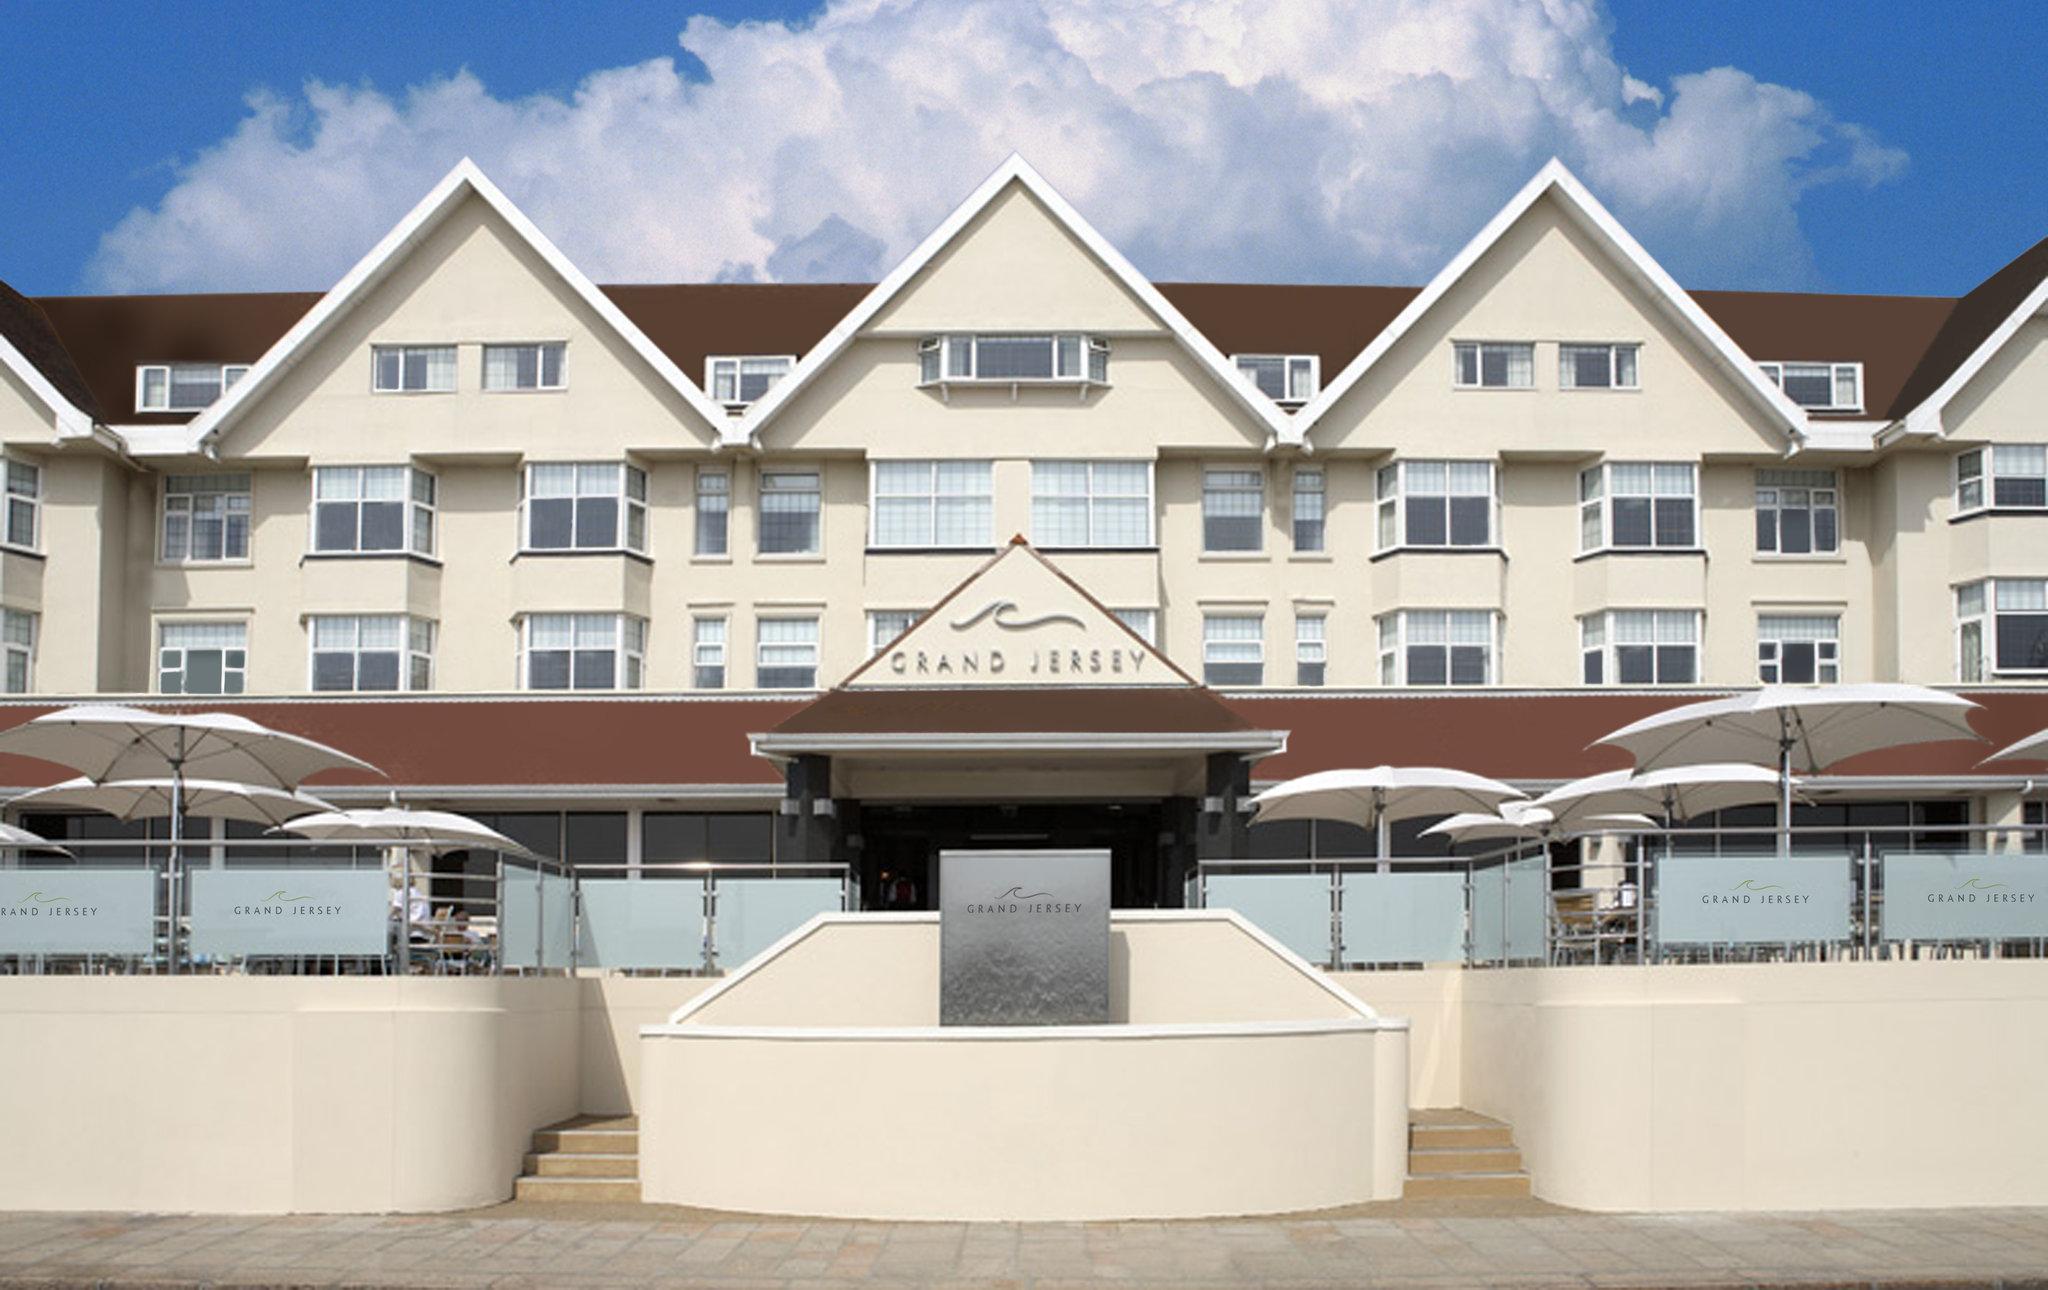 Grand Jersey Hotel & Spa, Jersey